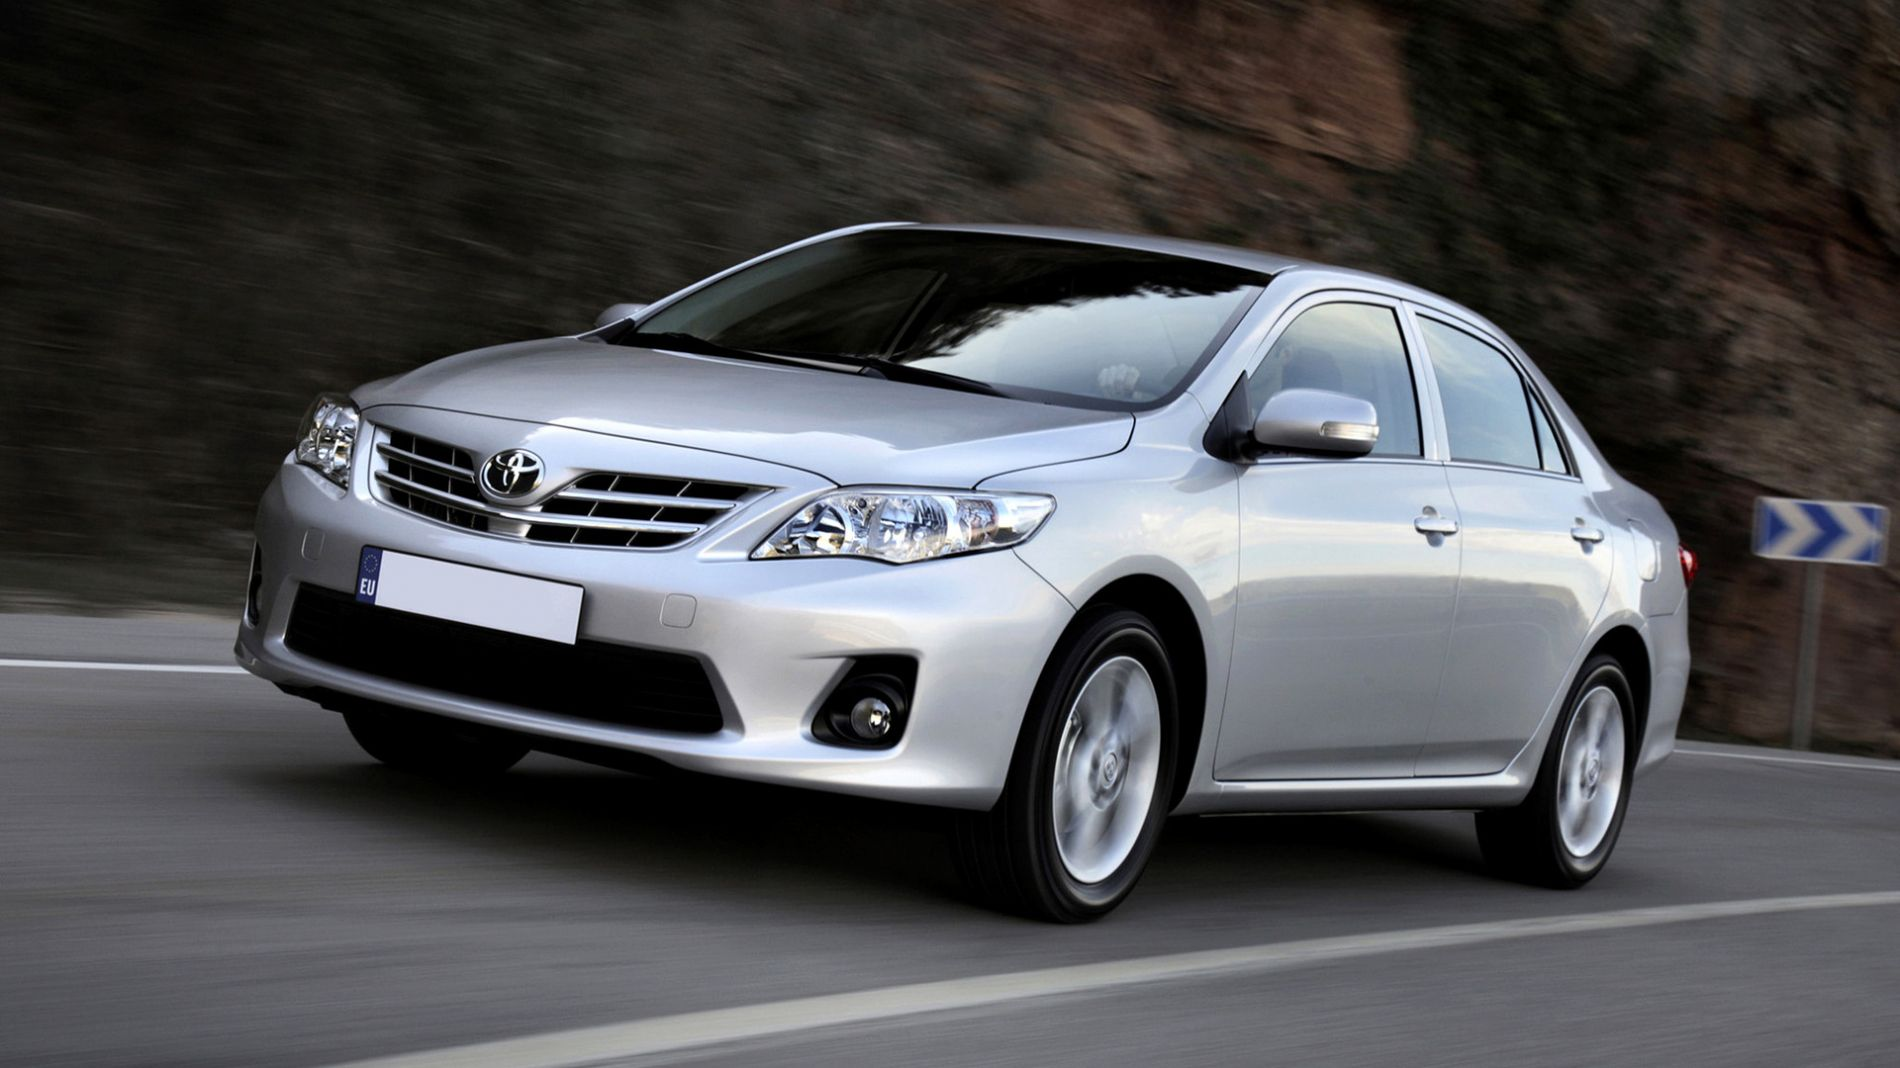 Toyota Corolla (E140/150)-ის 5 გავრცელებული პრობლემა